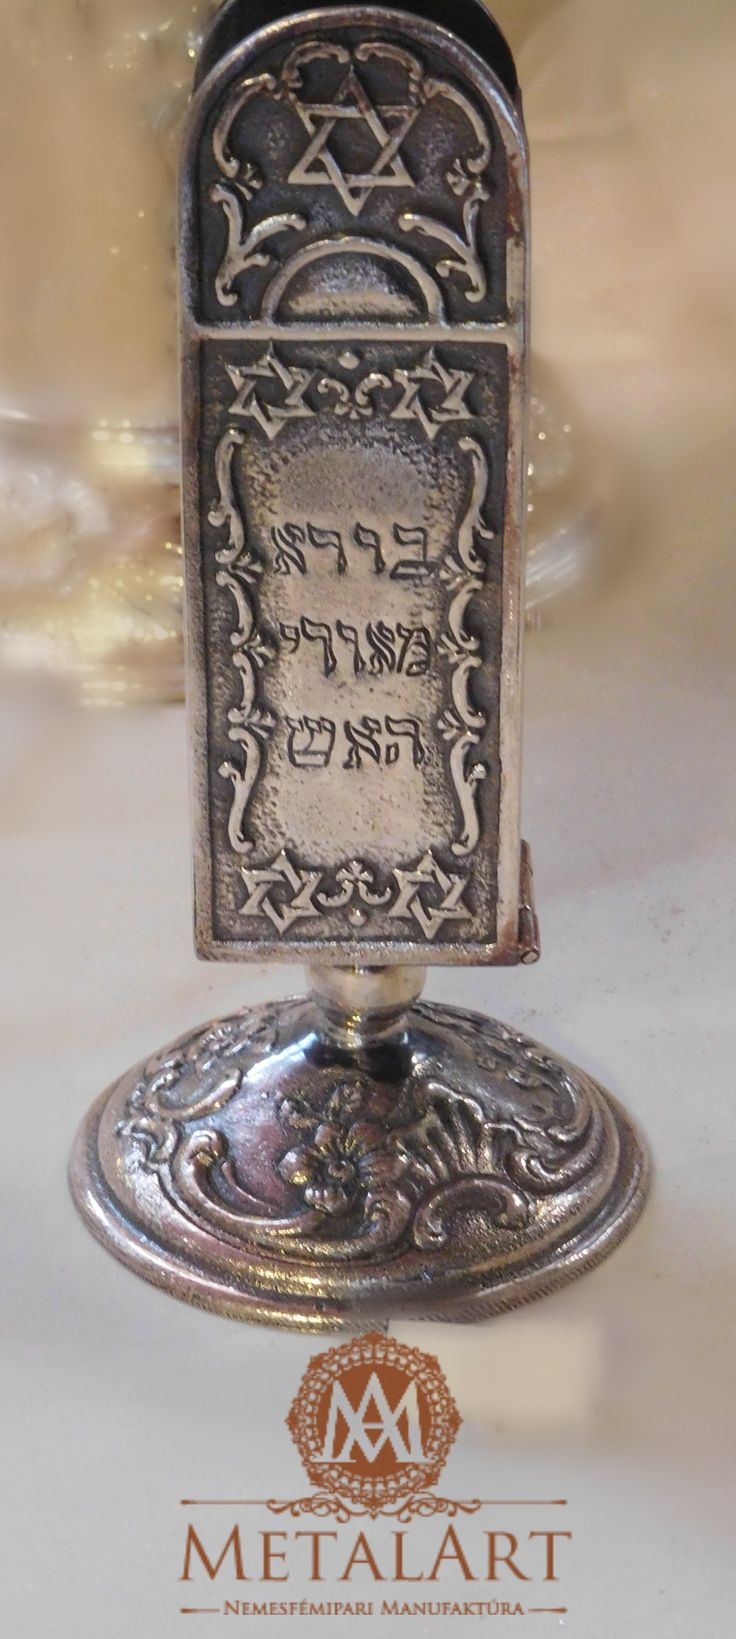 Judaica small candlestick #jewish #judaic #shop  contact us at: metalart@metalart.hu